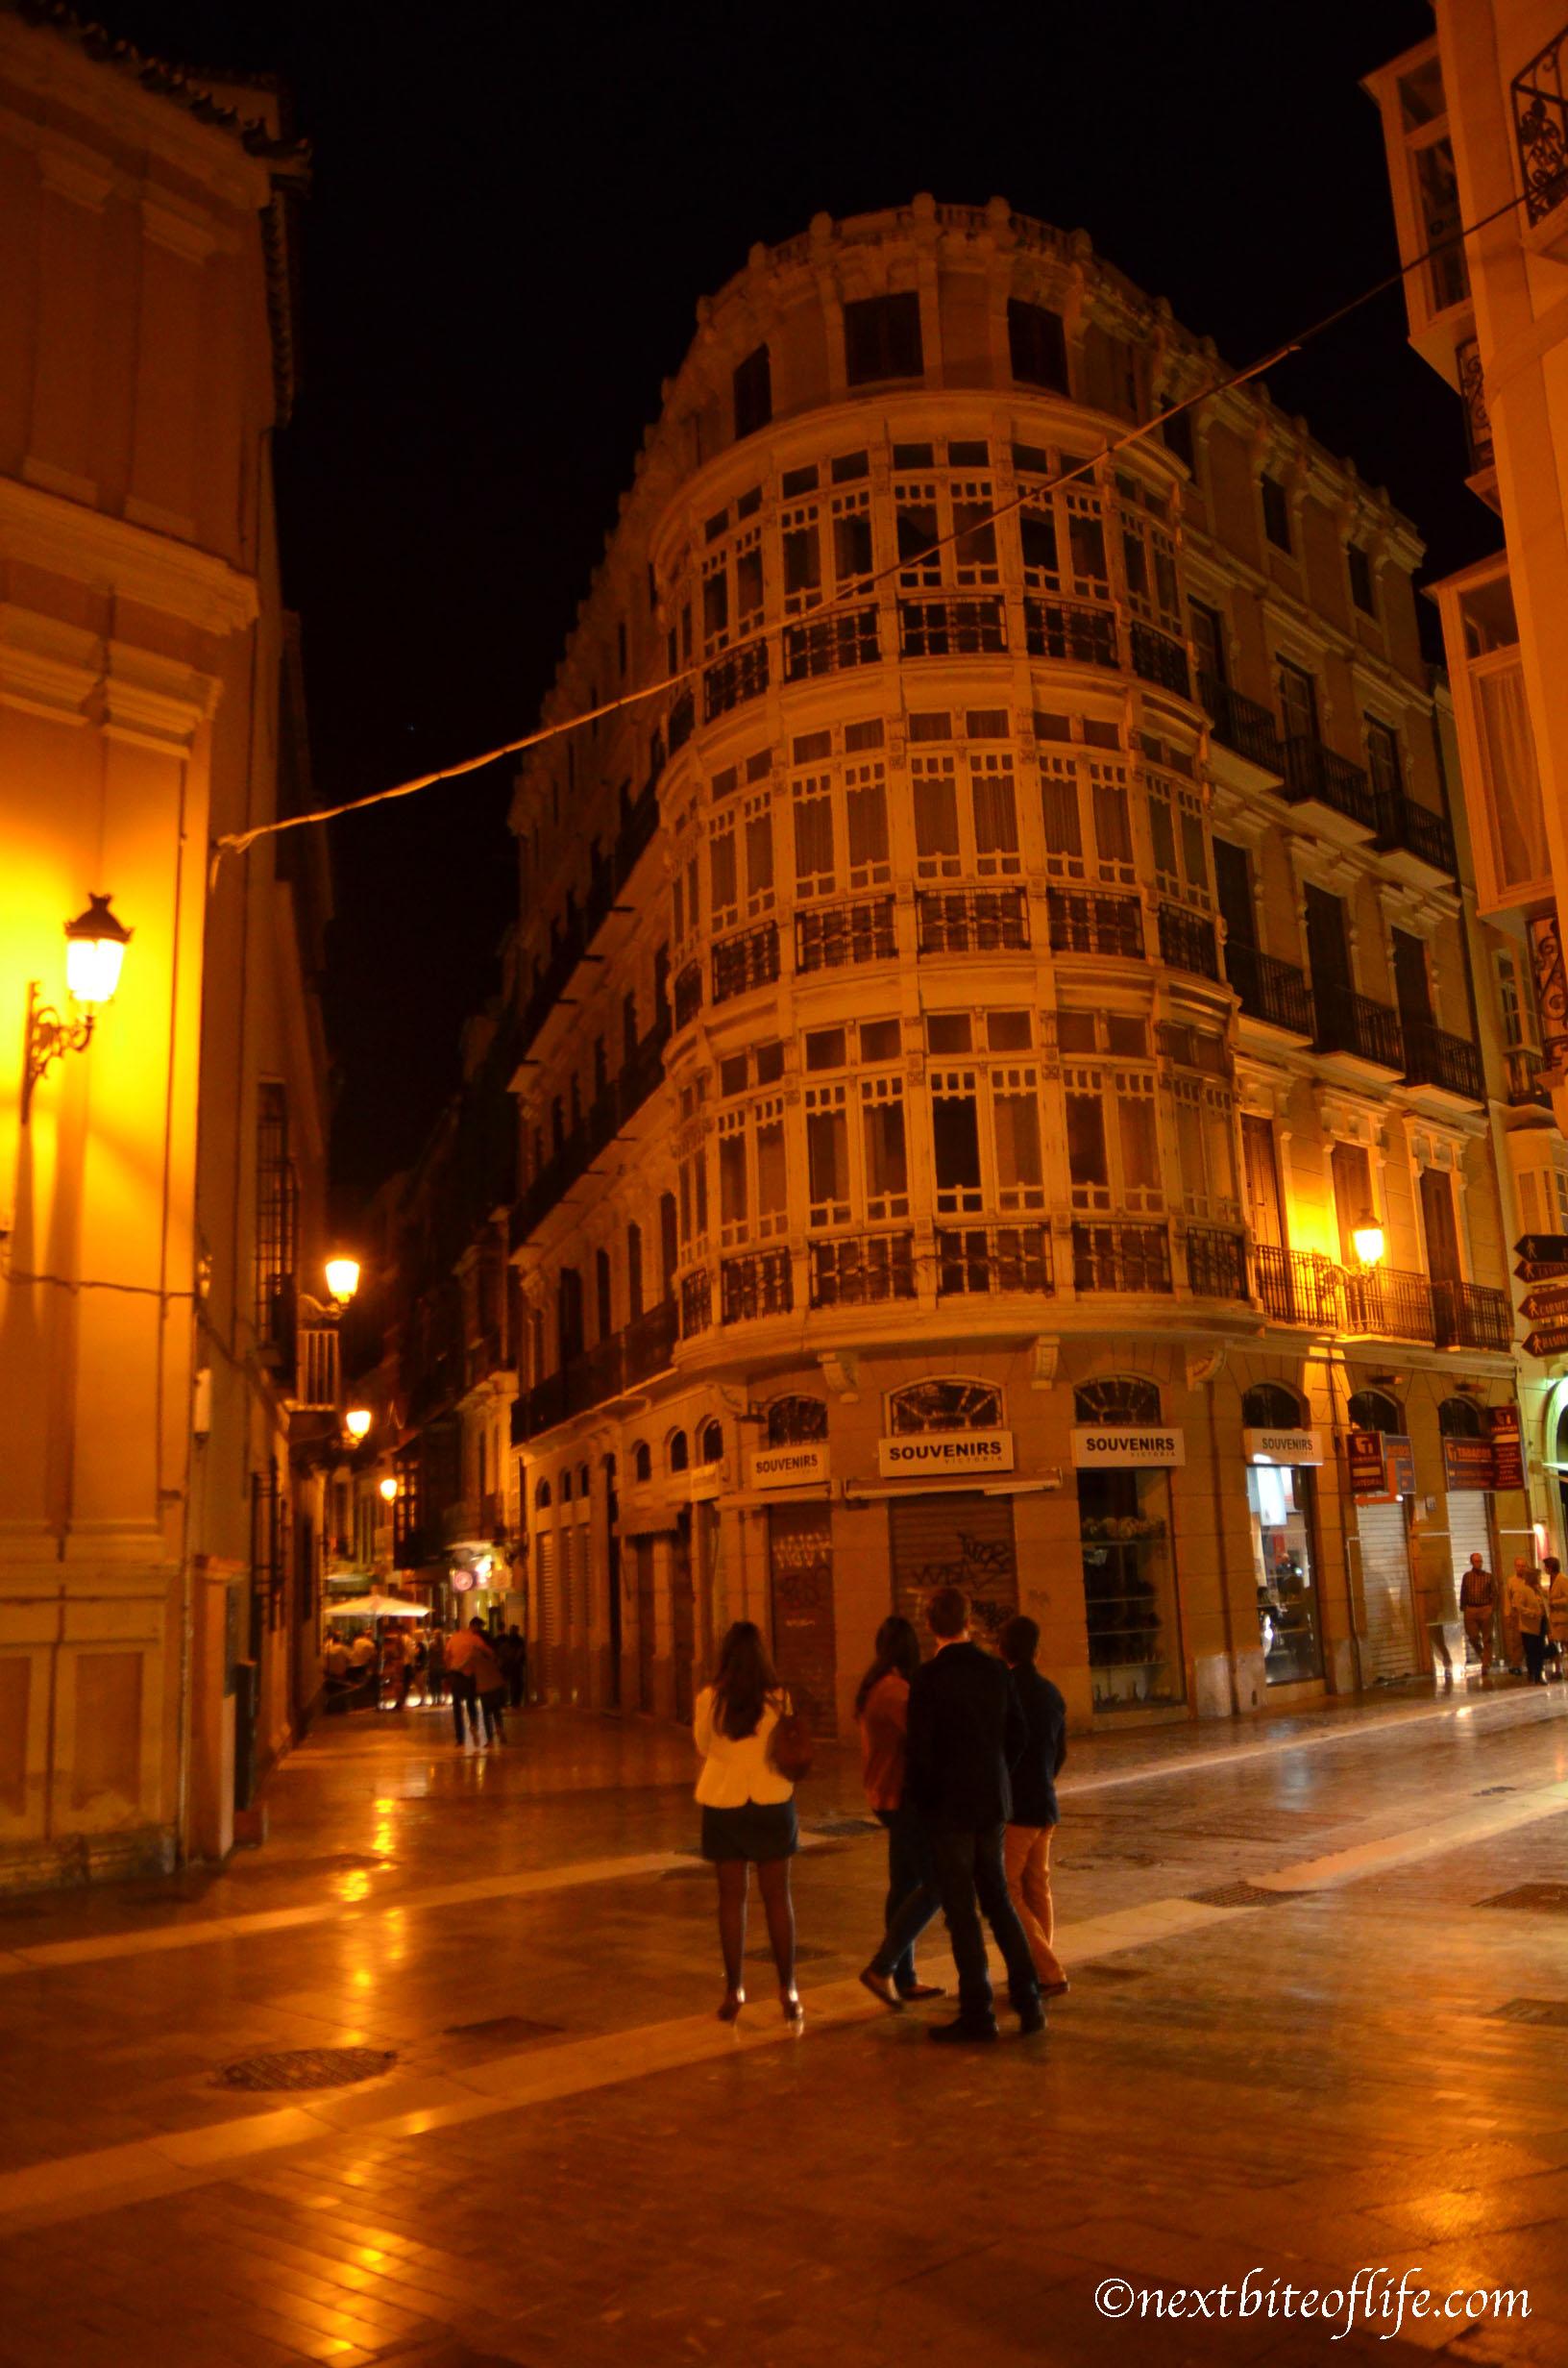 Malaga at midnight, a walk through the center